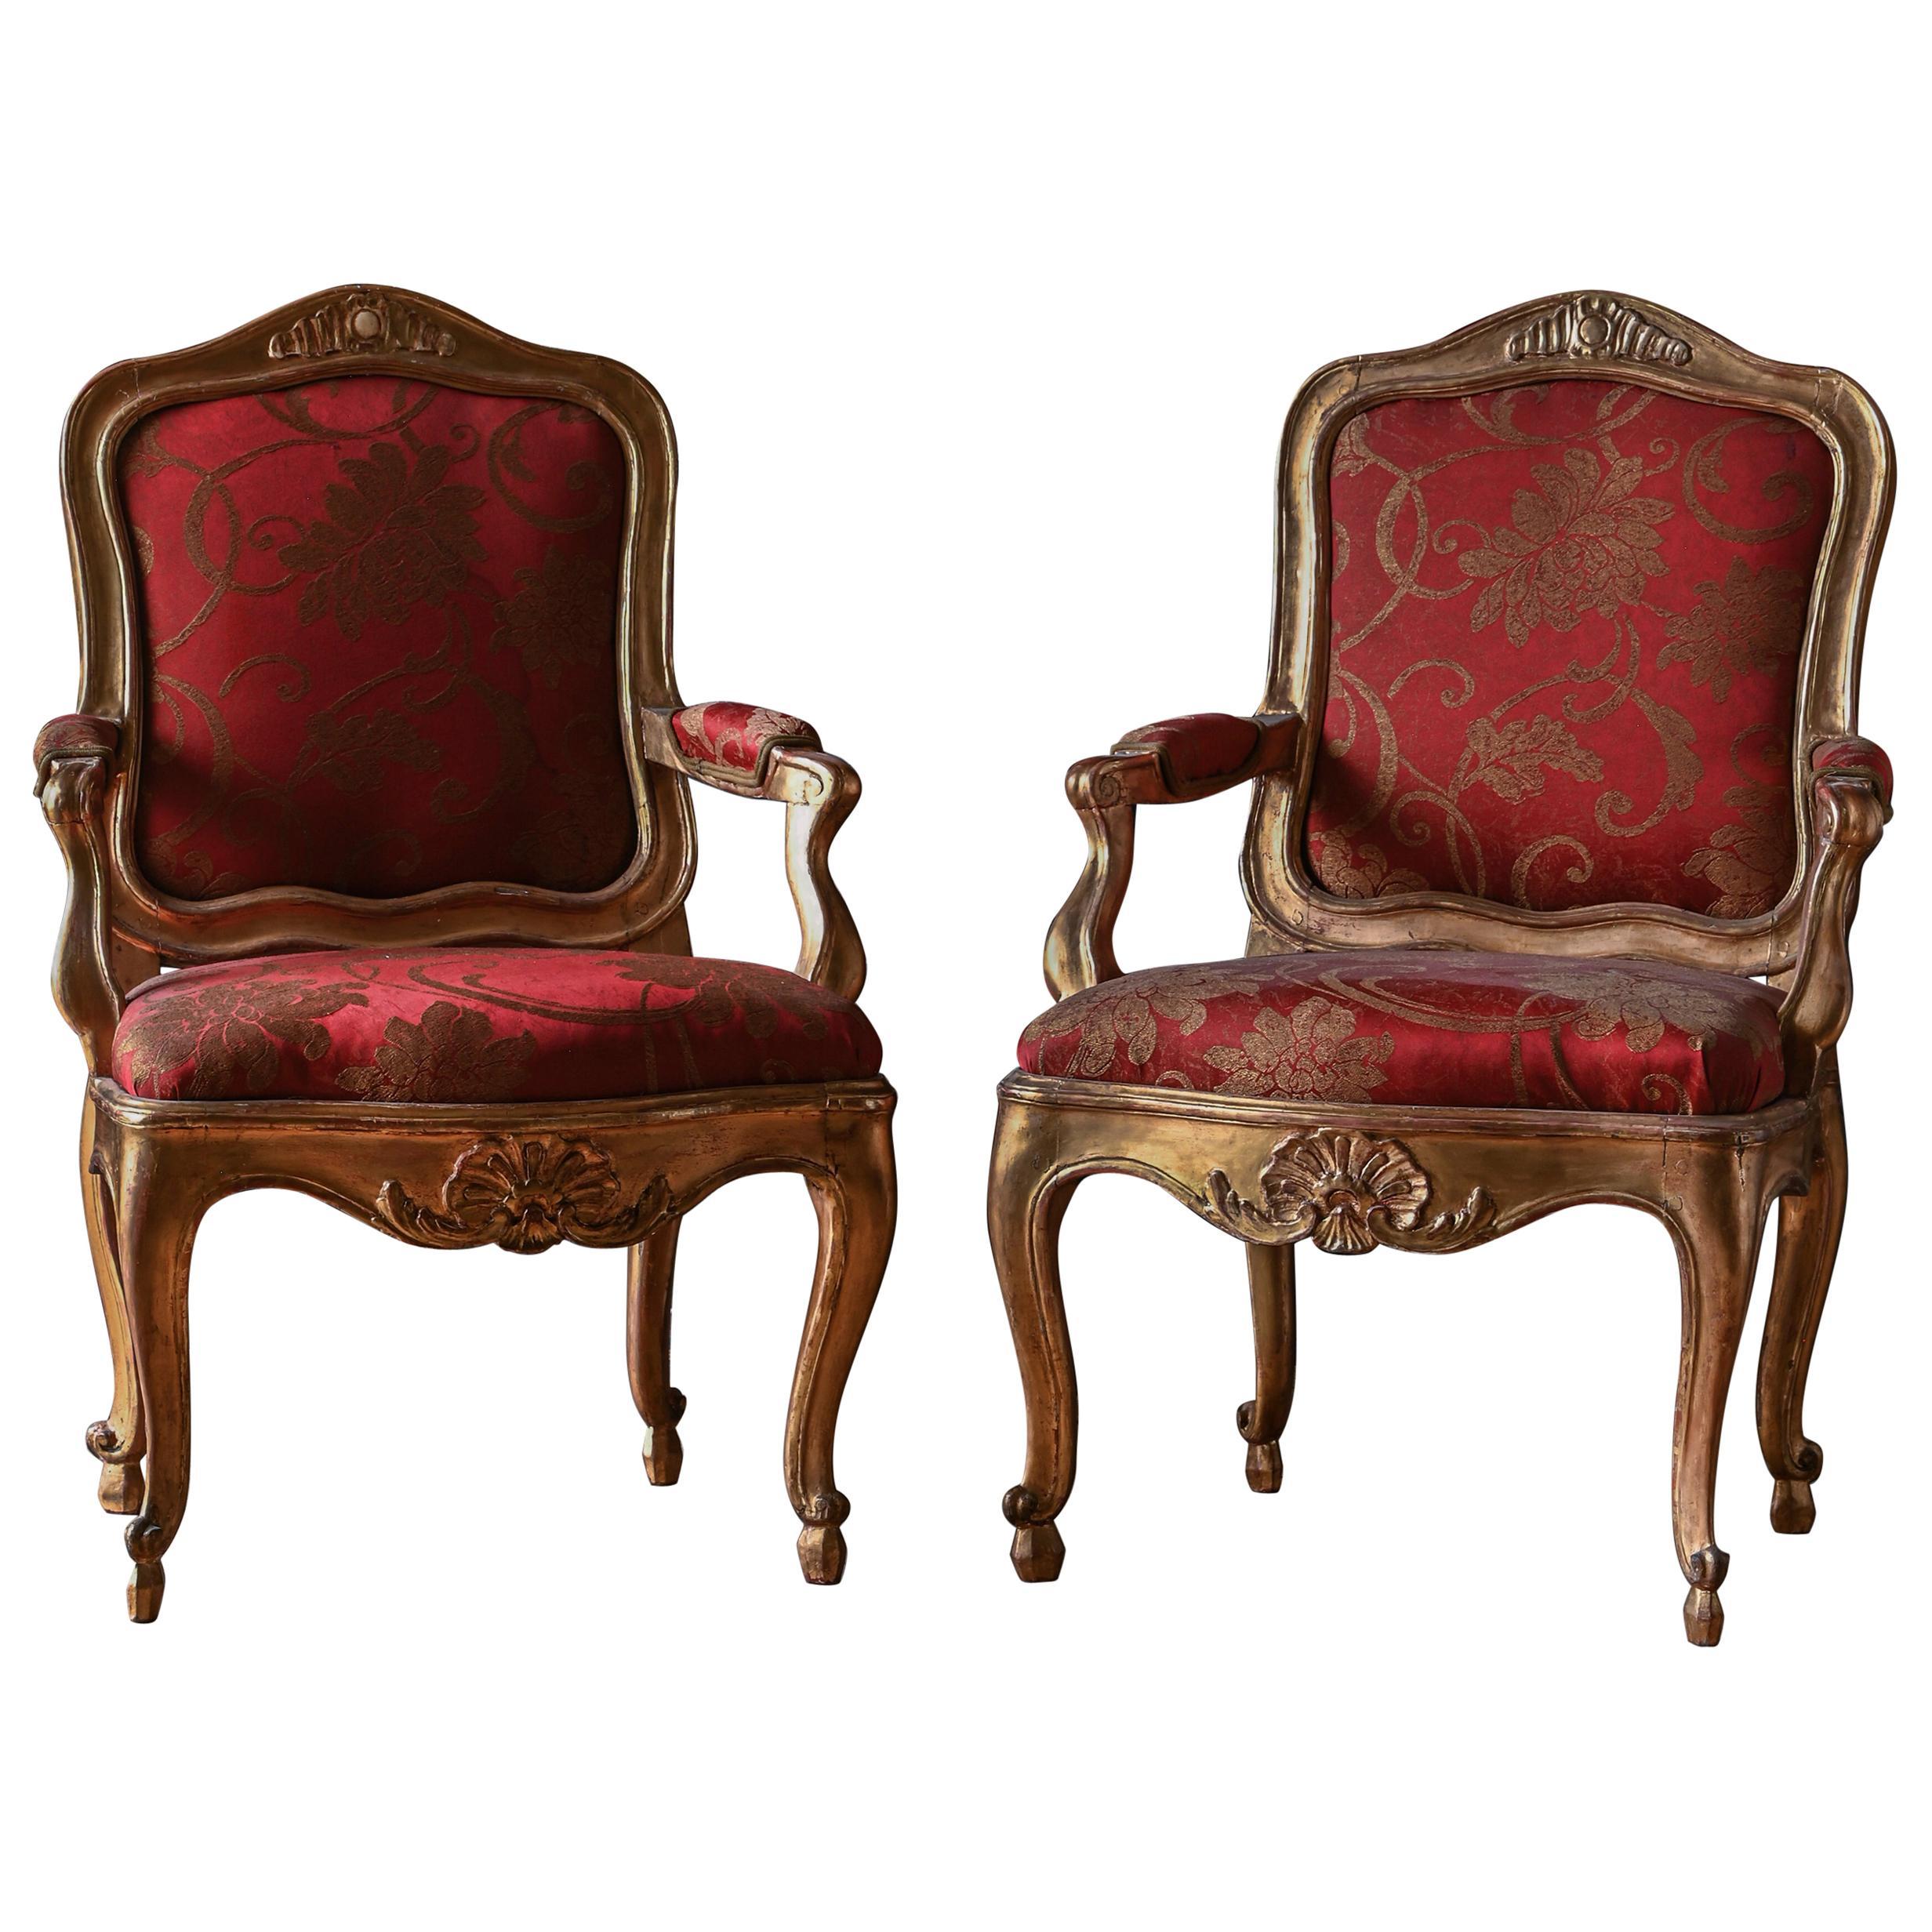 Fine Pair of 18th Century Swedish Rococo Armchairs